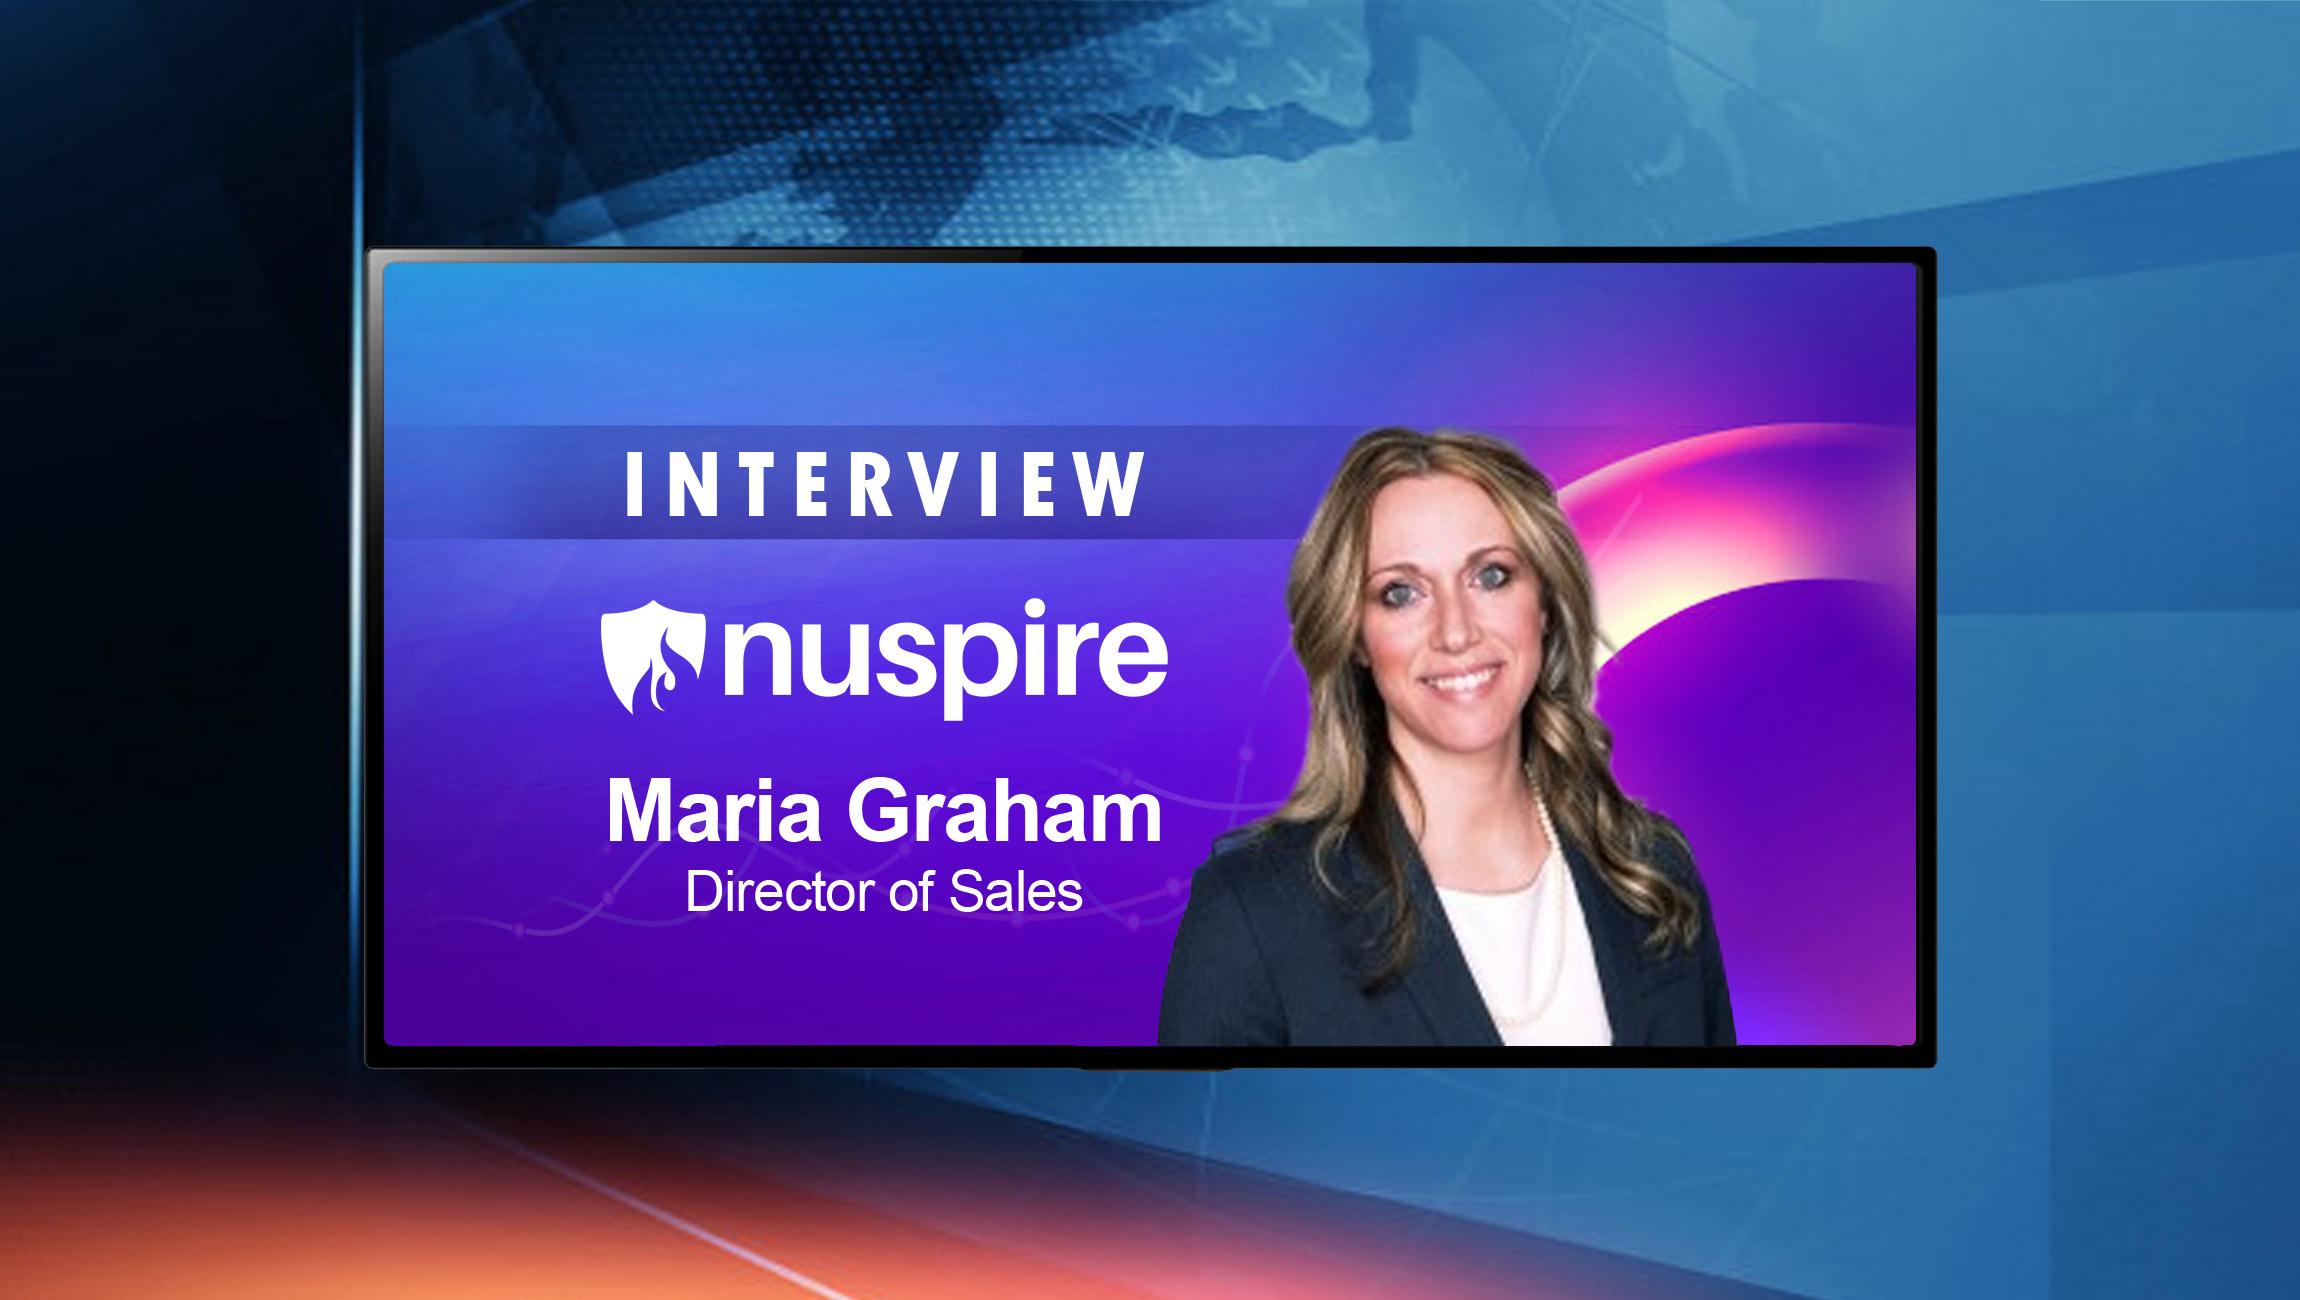 SaleTechStar Interview with Maria Graham, Director of Sales, Nuspire